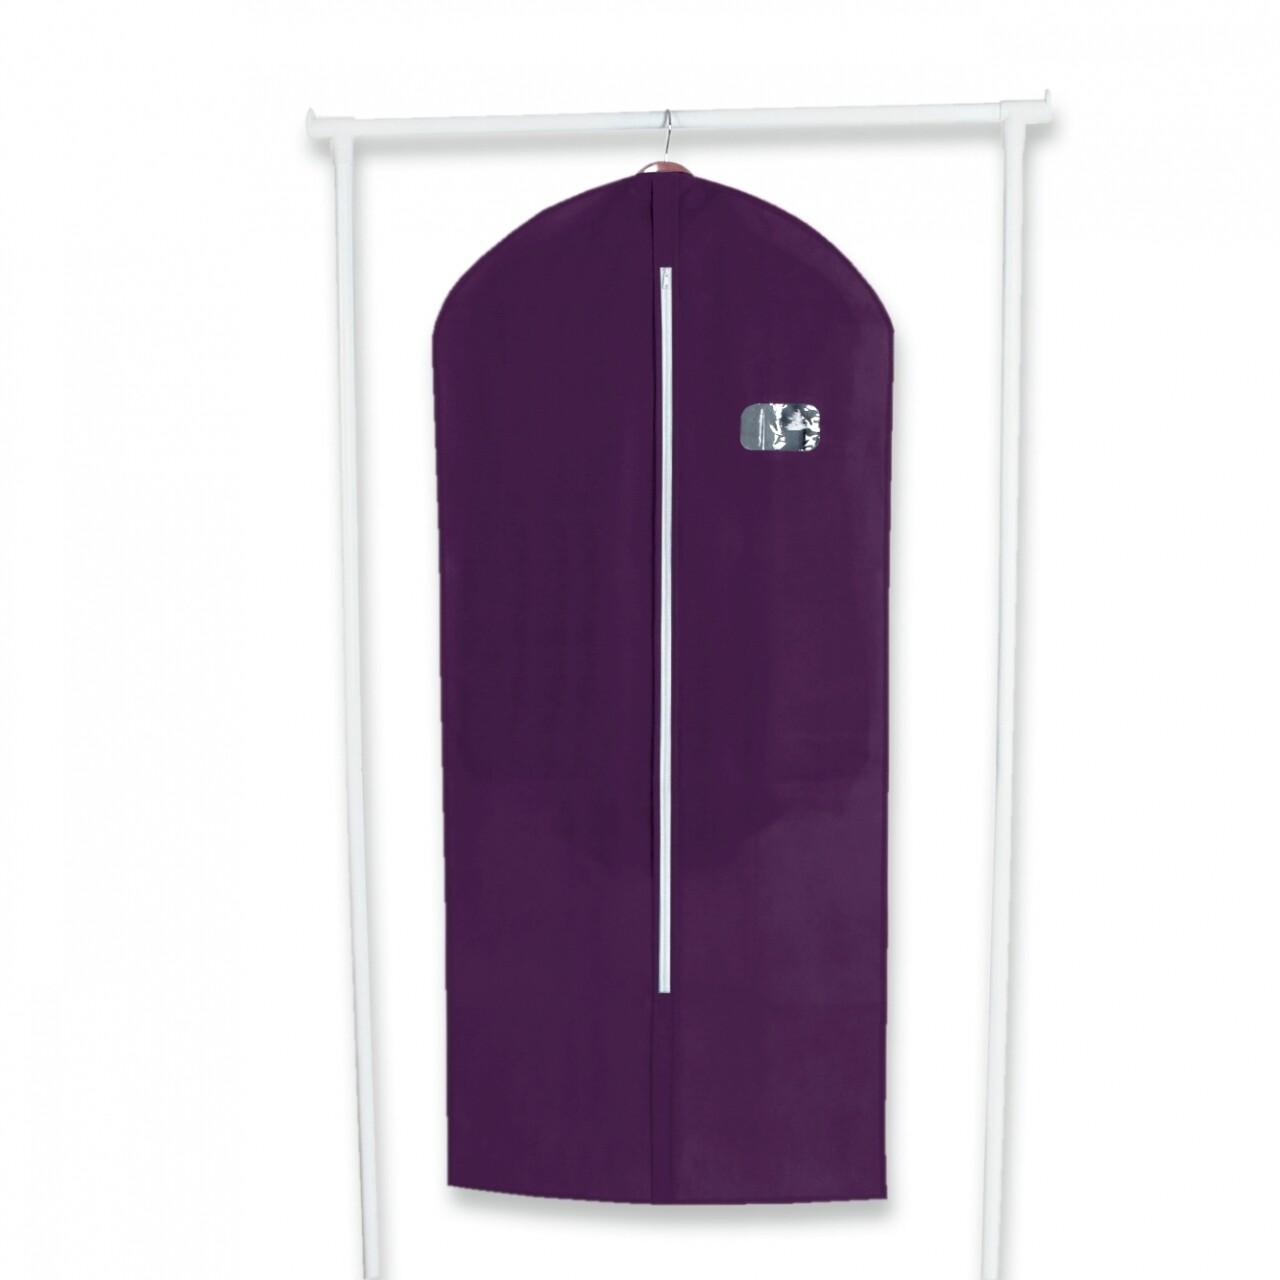 Husa pentru haine Purple, Jocca, 60x136 cm, polipropilena, mov